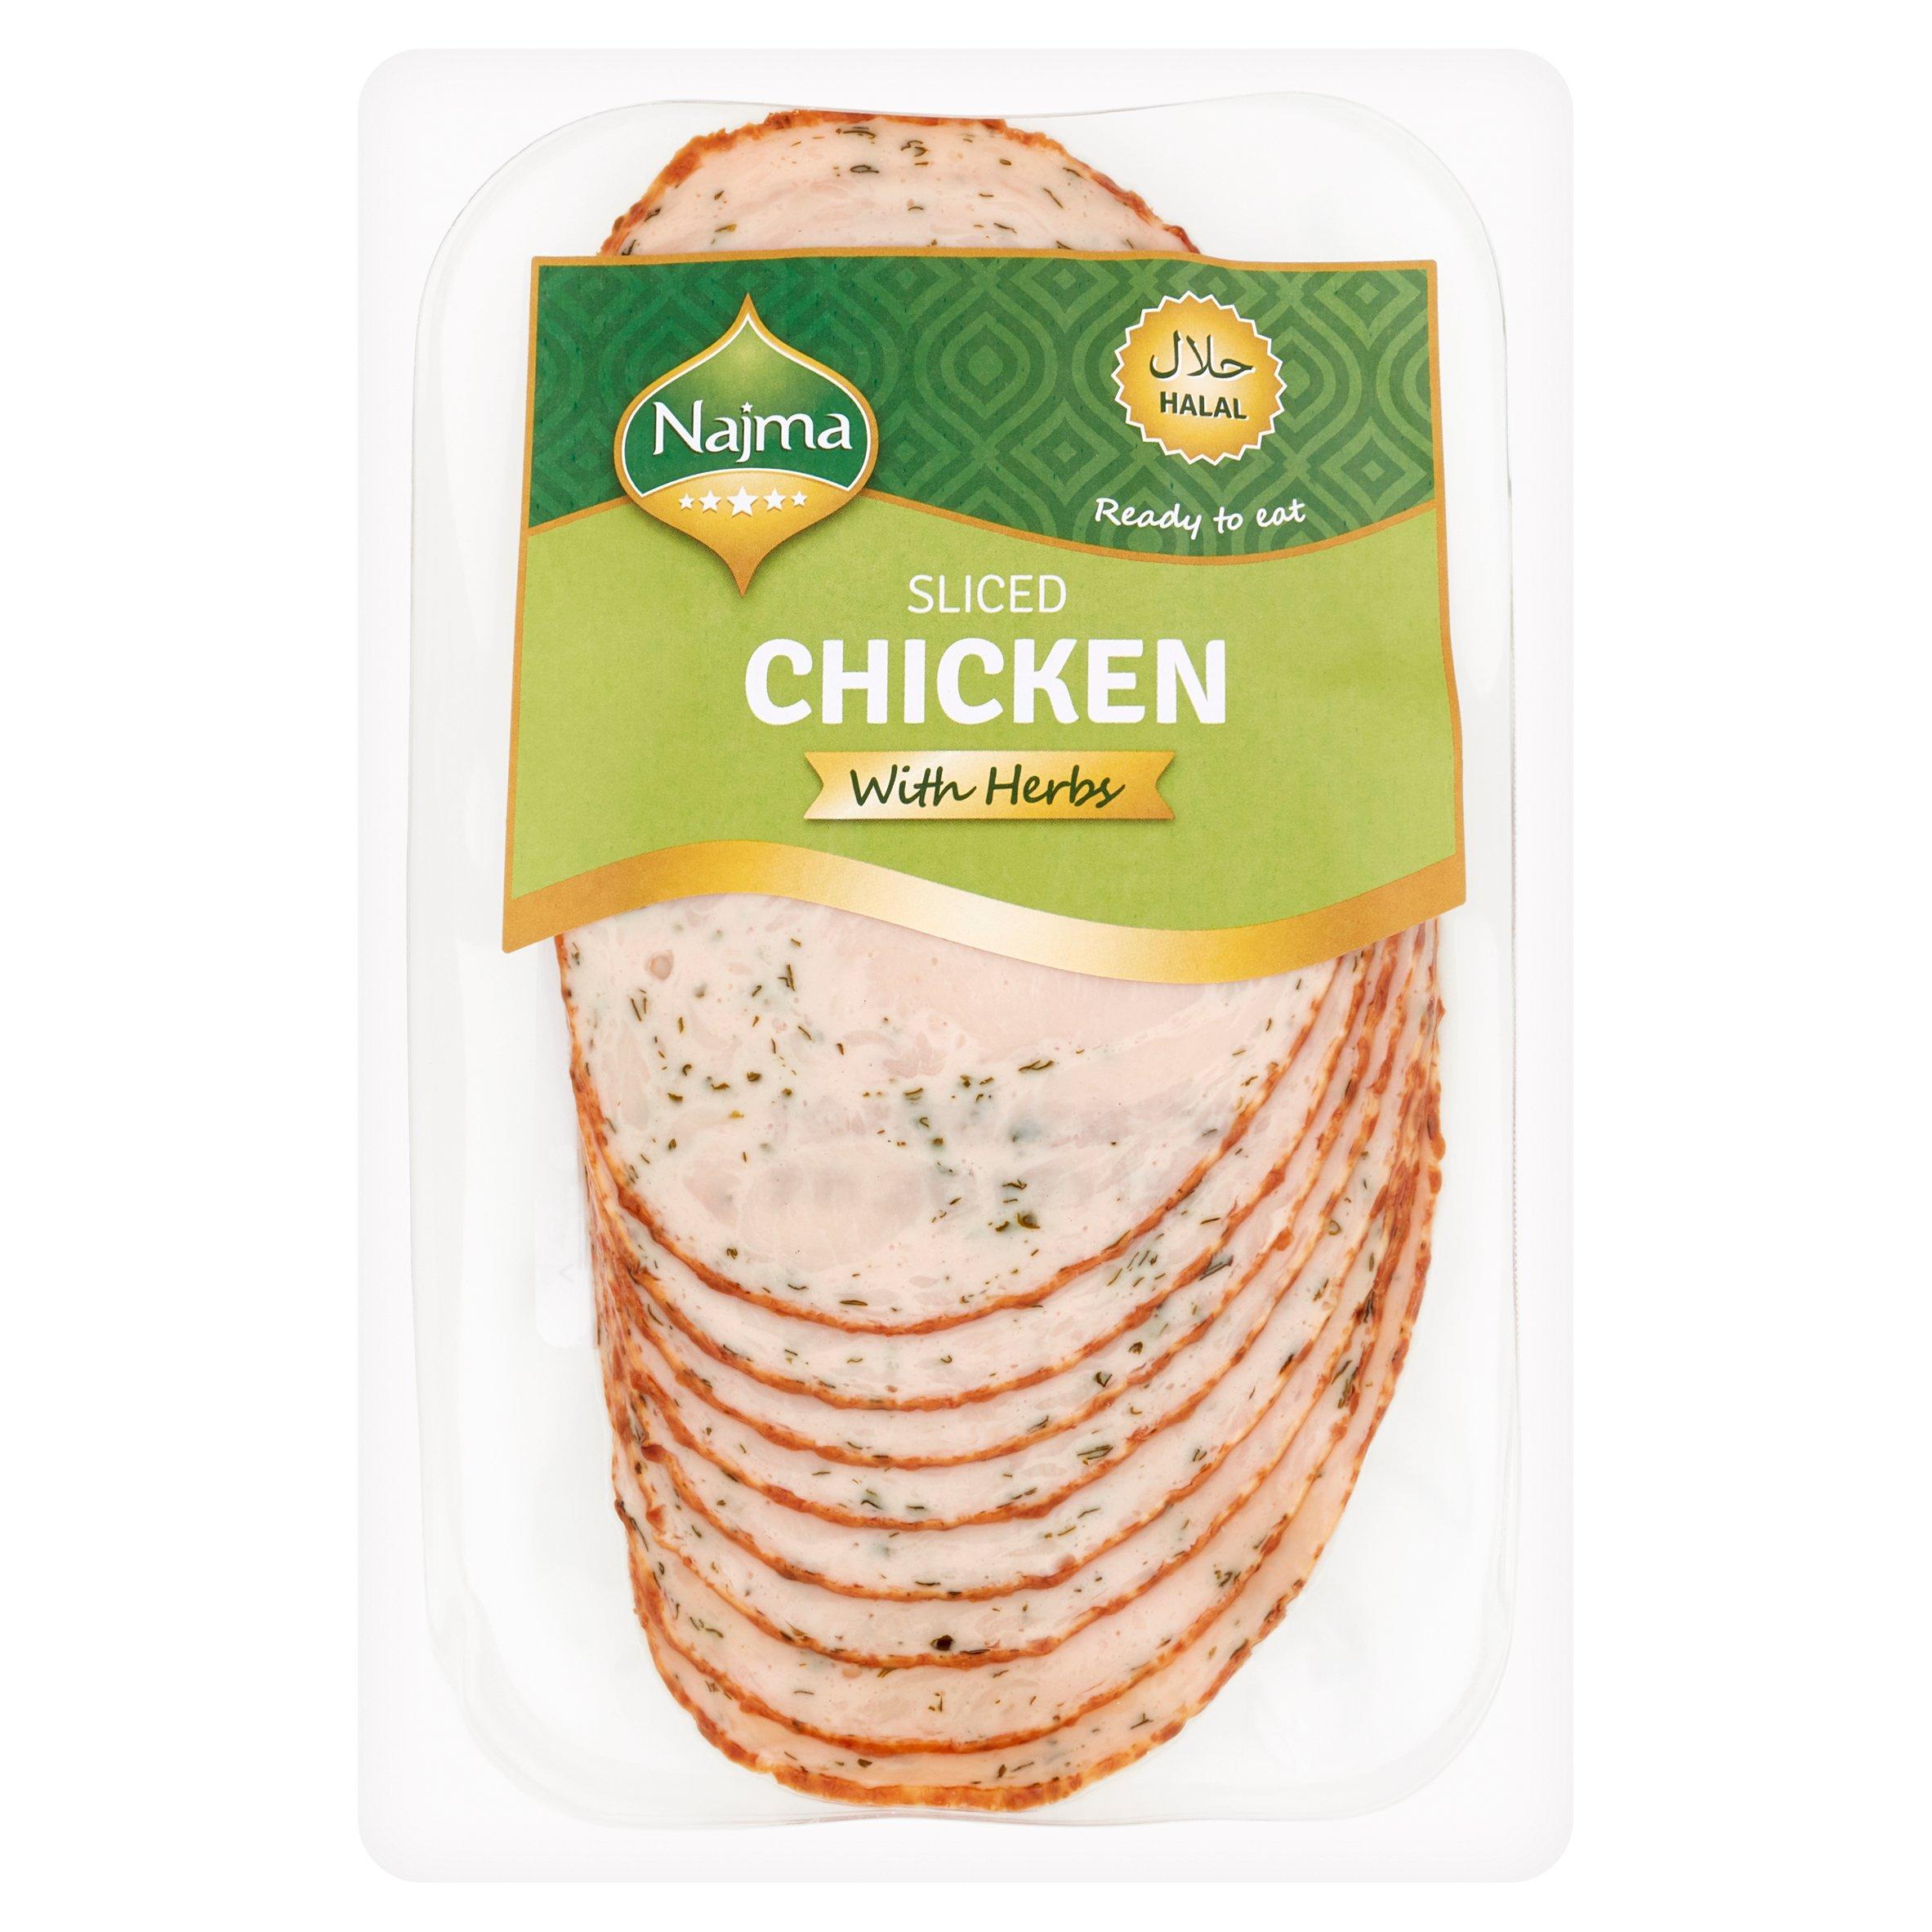 Najma Sliced Chicken With Herbs 150G